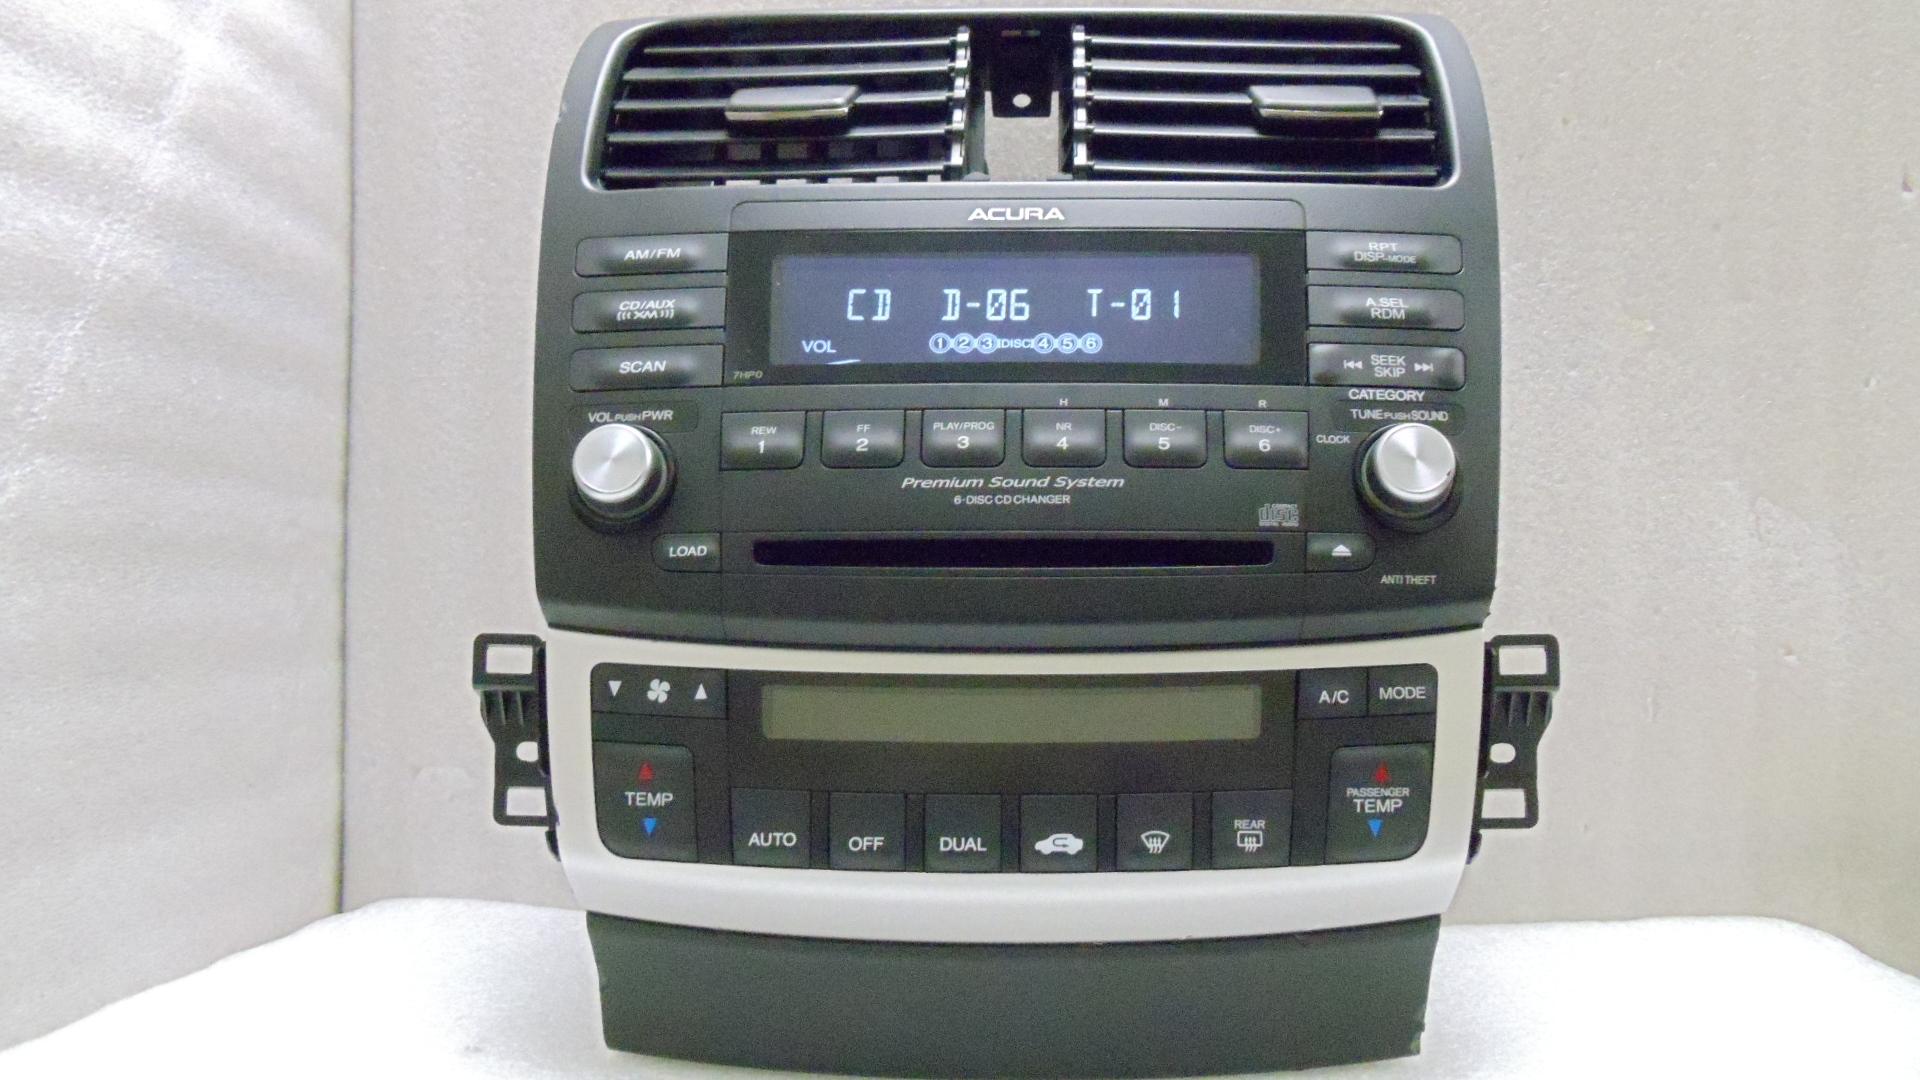 2004 2008 acura tsx radio 6 disc changer cd player 7hp0